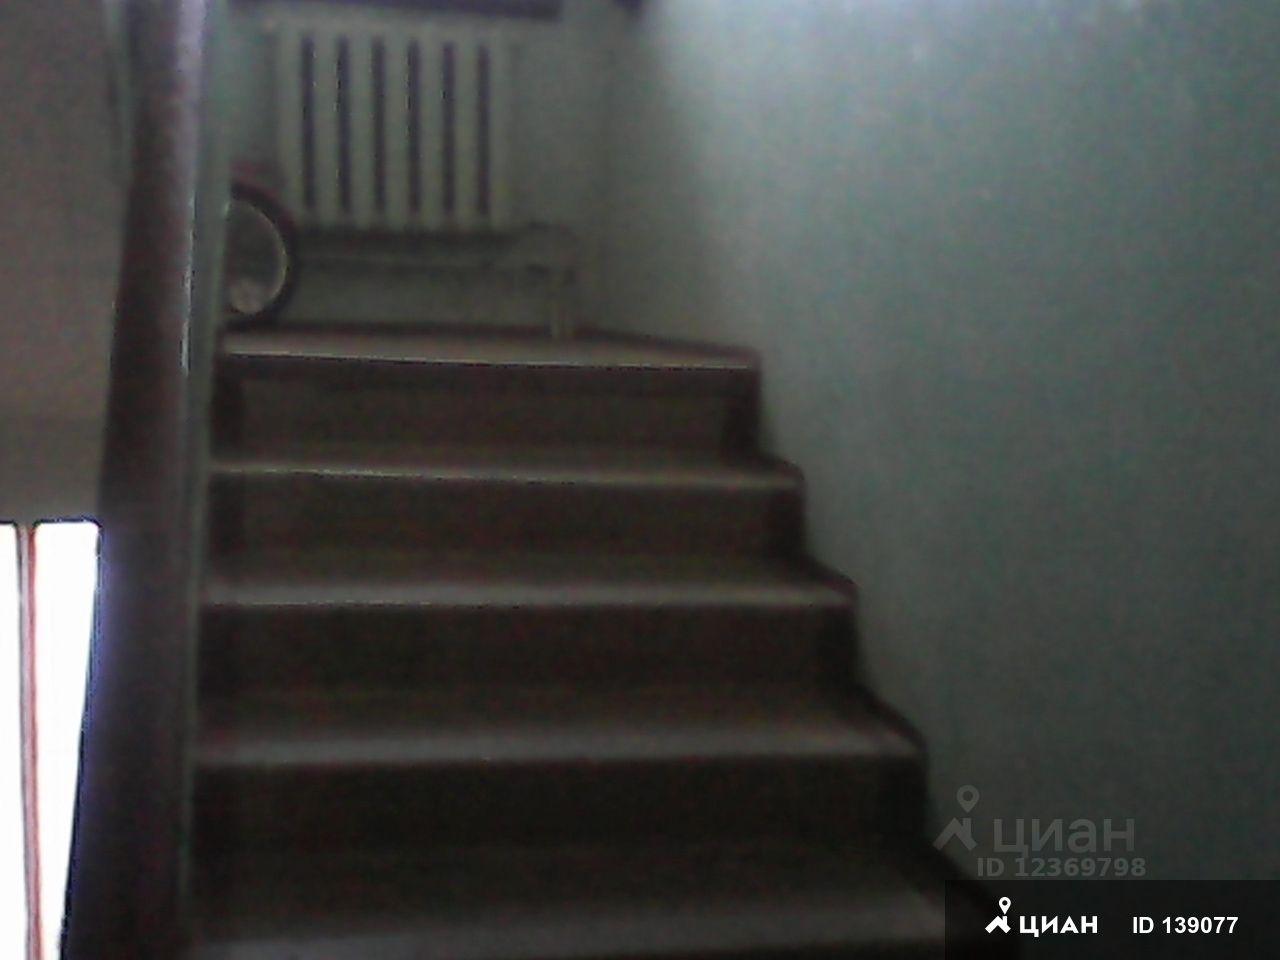 продам двухкомнатную квартиру Раменский район, поселок Электроизолятор, д. 12